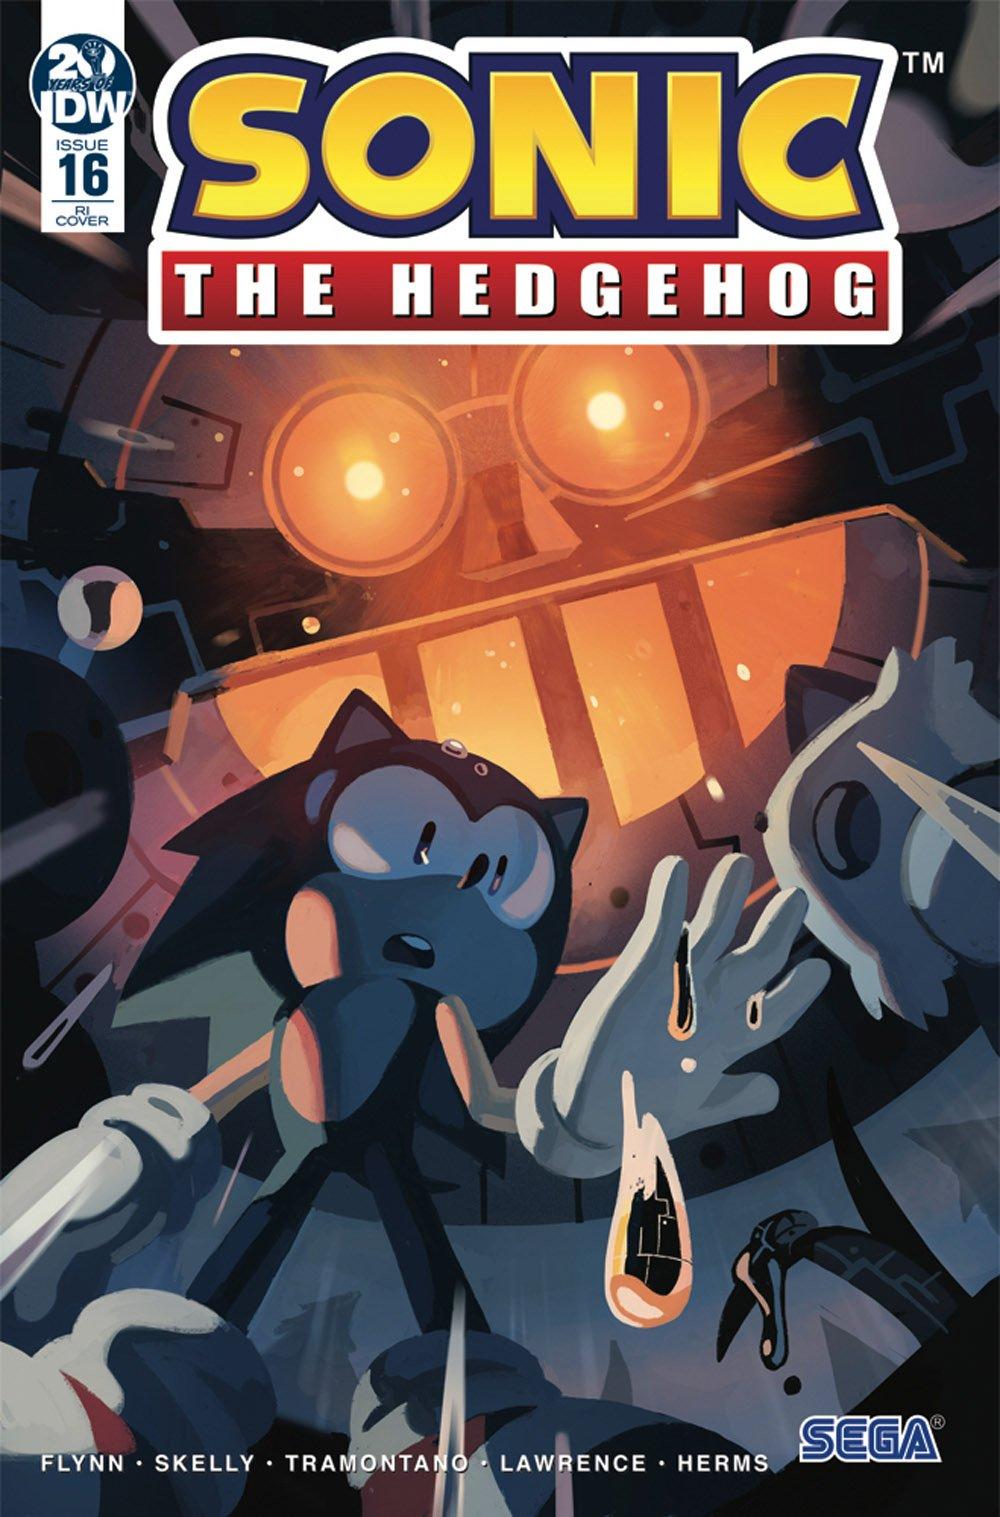 Sonic the Hedgehog 016 (April 2019) (retailer incentive)